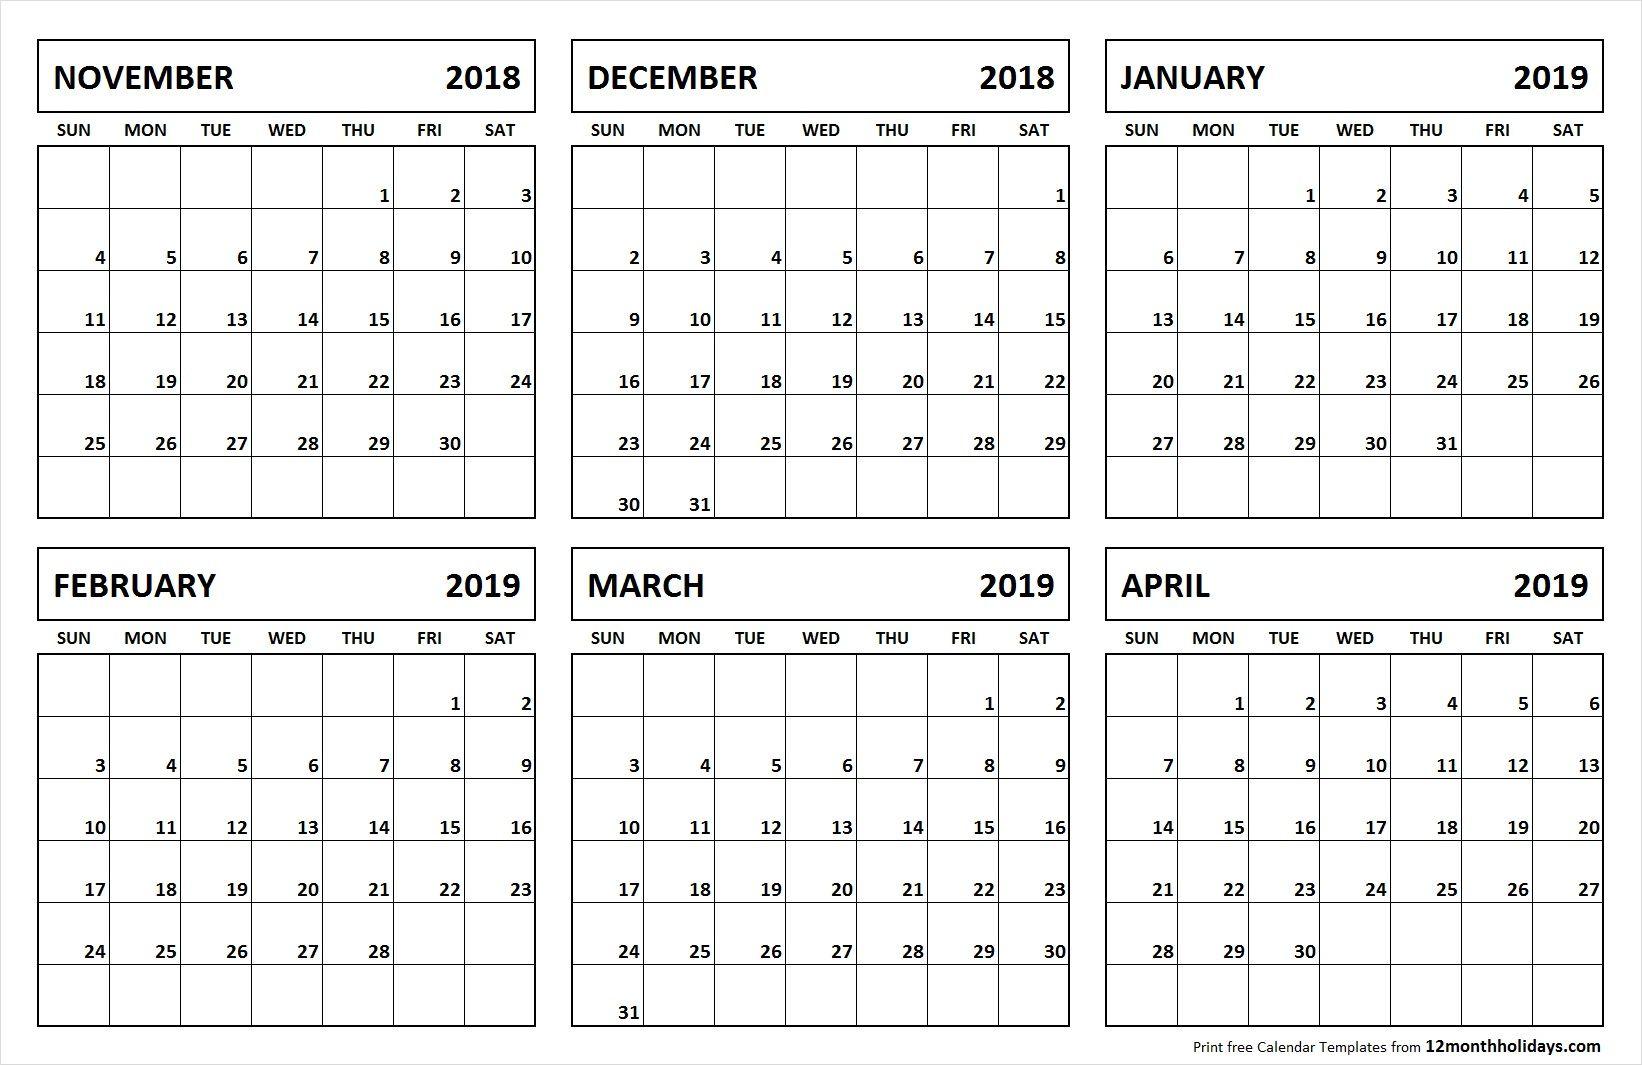 6 Month Calendar November 2018 April 2019 | November 2018 To